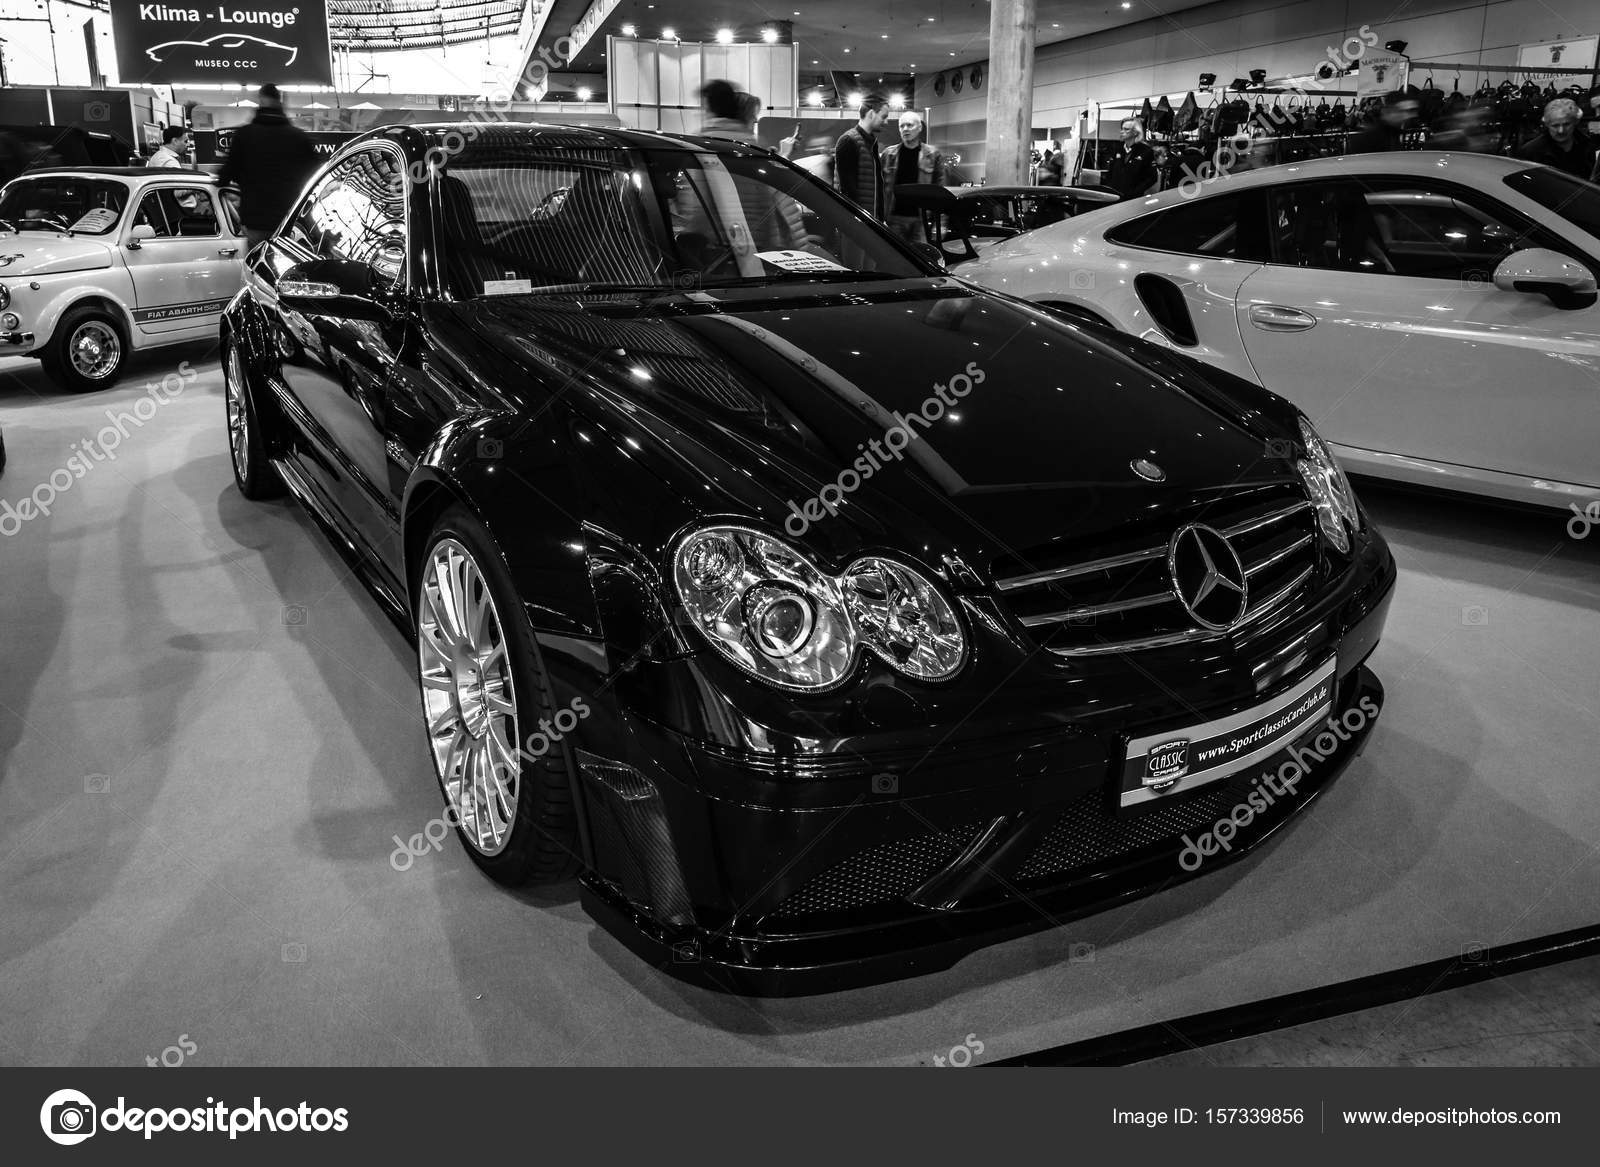 Mid Size Luxury Sports Car Mercedes Benz Clk63 Amg Black